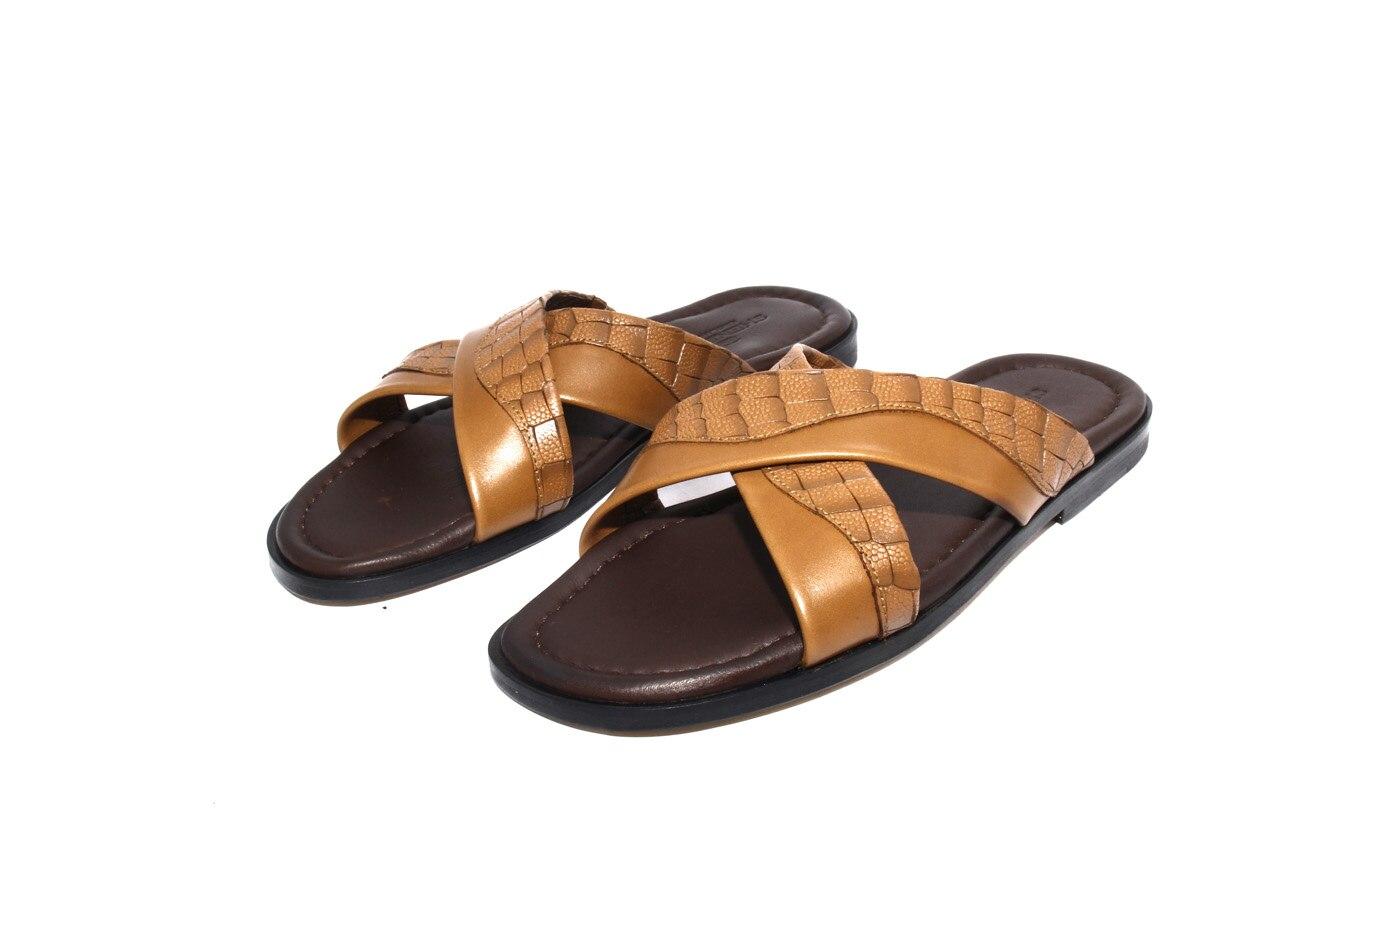 SHENBIN'S-منزلقات جلدية كاملة ، نعال جلدية ، نعل داخلي ناعم ، تبغ وبني ، أحذية رياضية خارجية